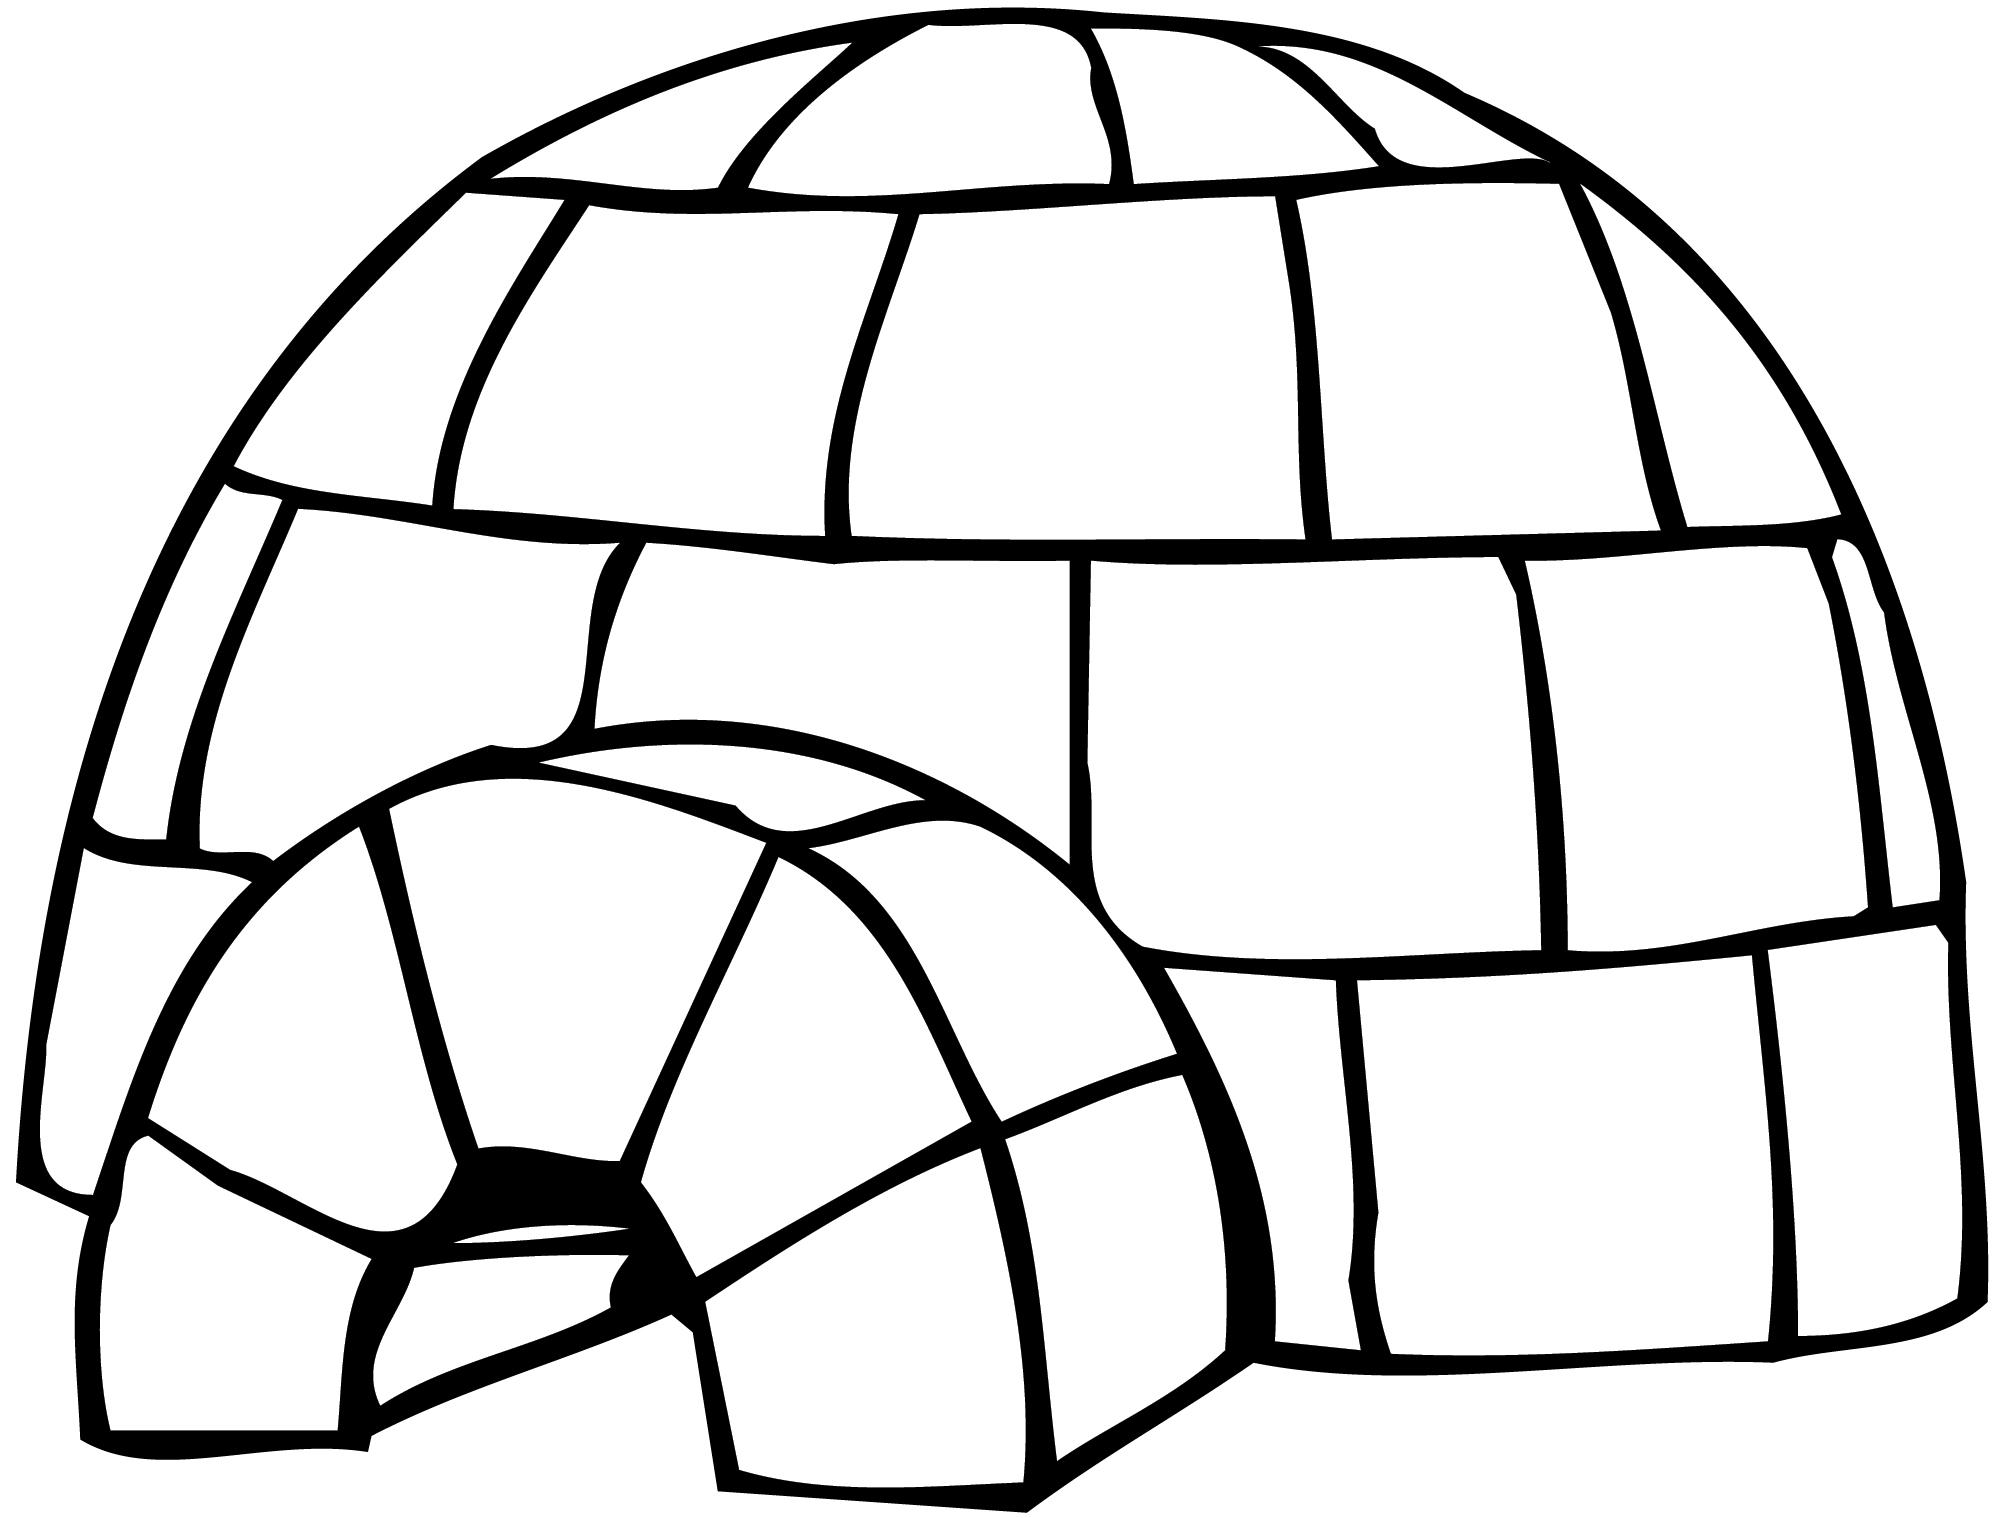 hight resolution of igloo clip art